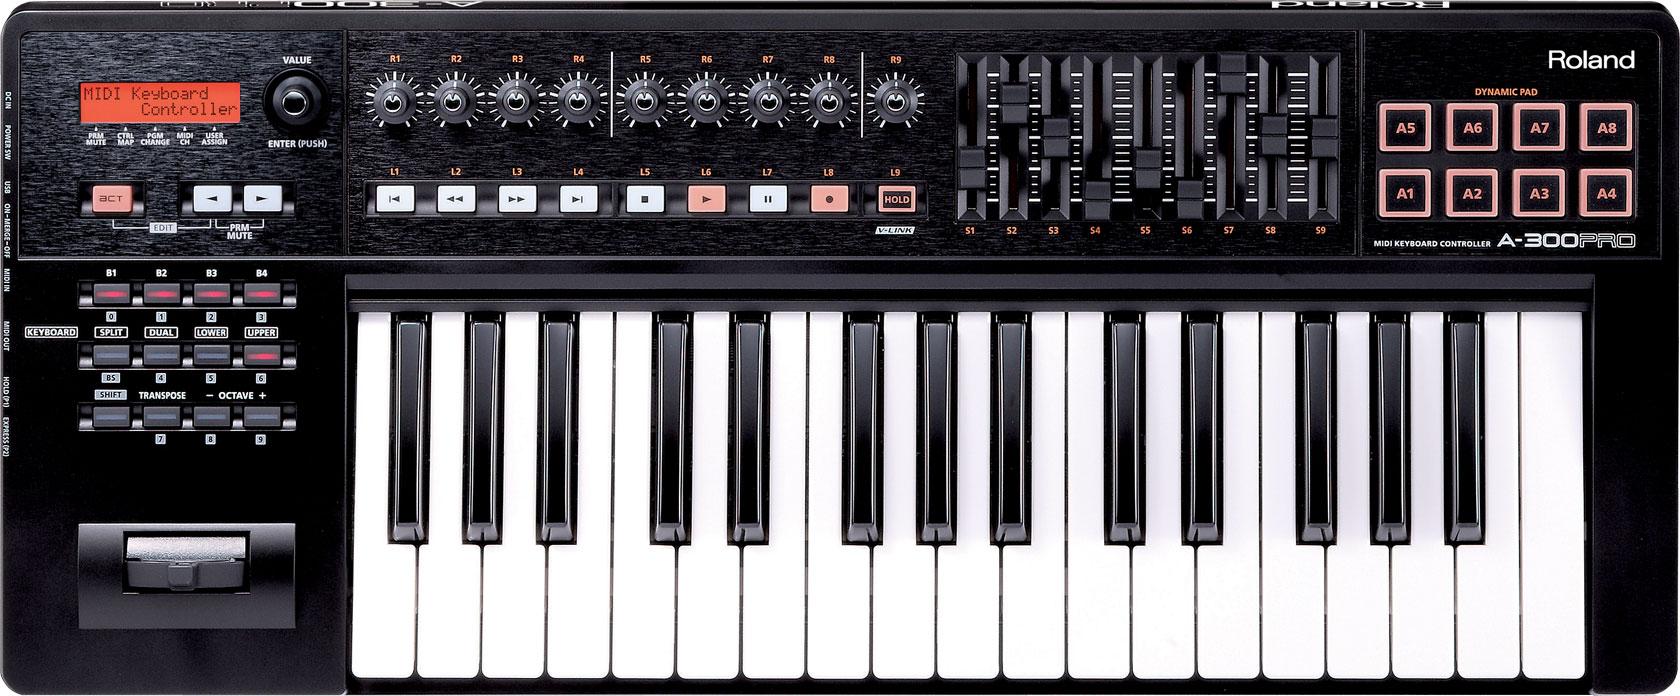 Roland - A-300PRO | MIDI Keyboard Controller